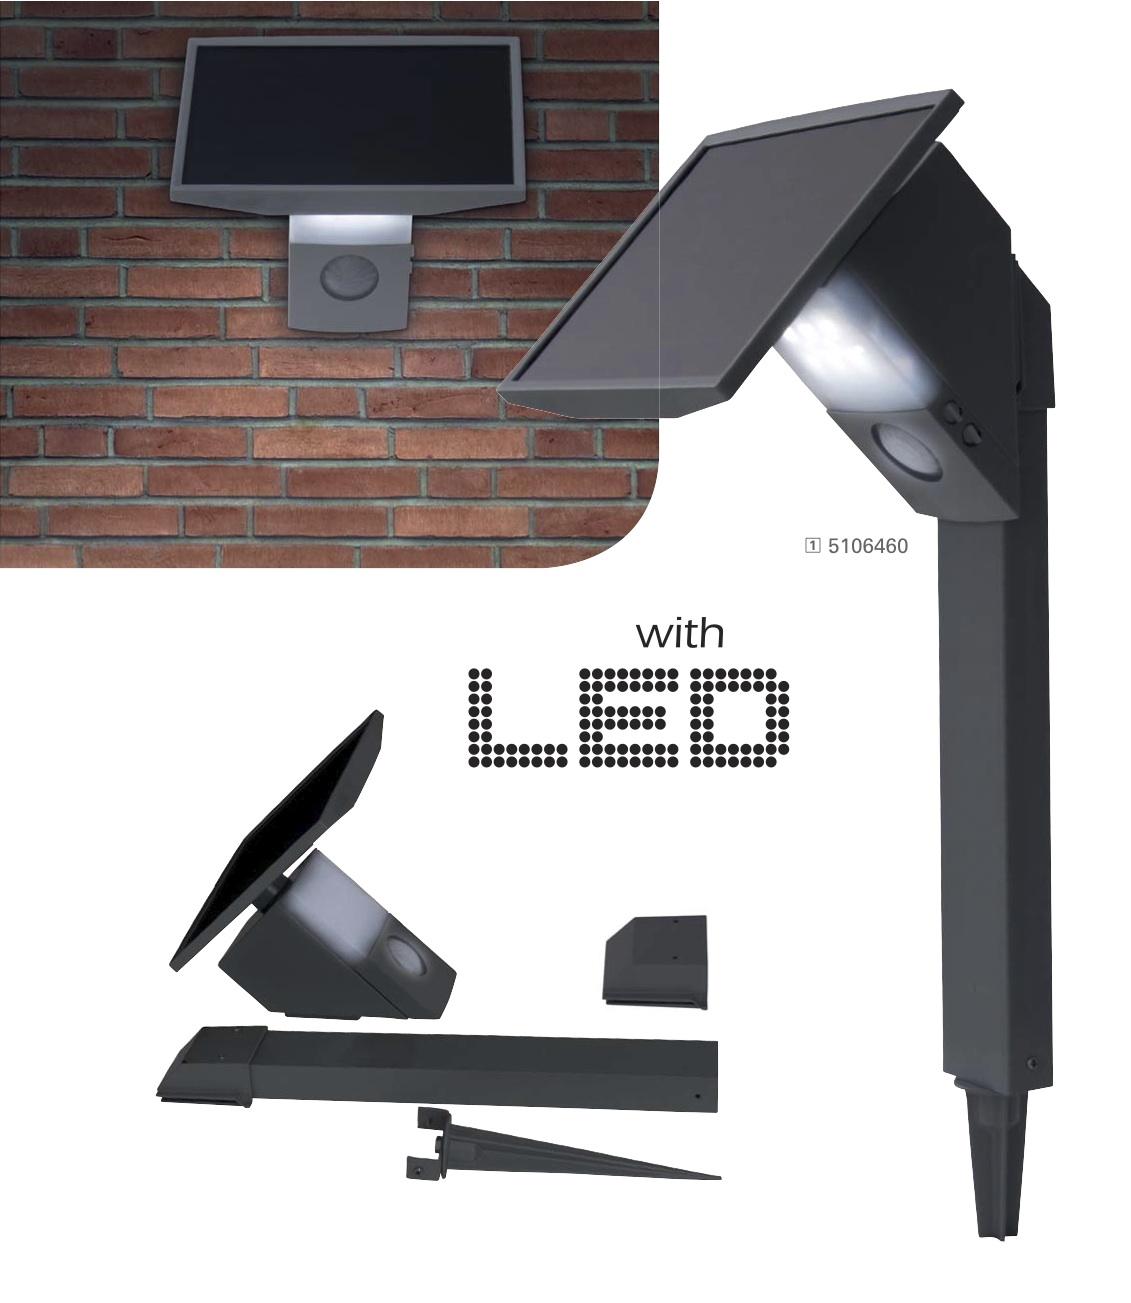 borne solaire puissante 480 lumens eclairage solaire. Black Bedroom Furniture Sets. Home Design Ideas